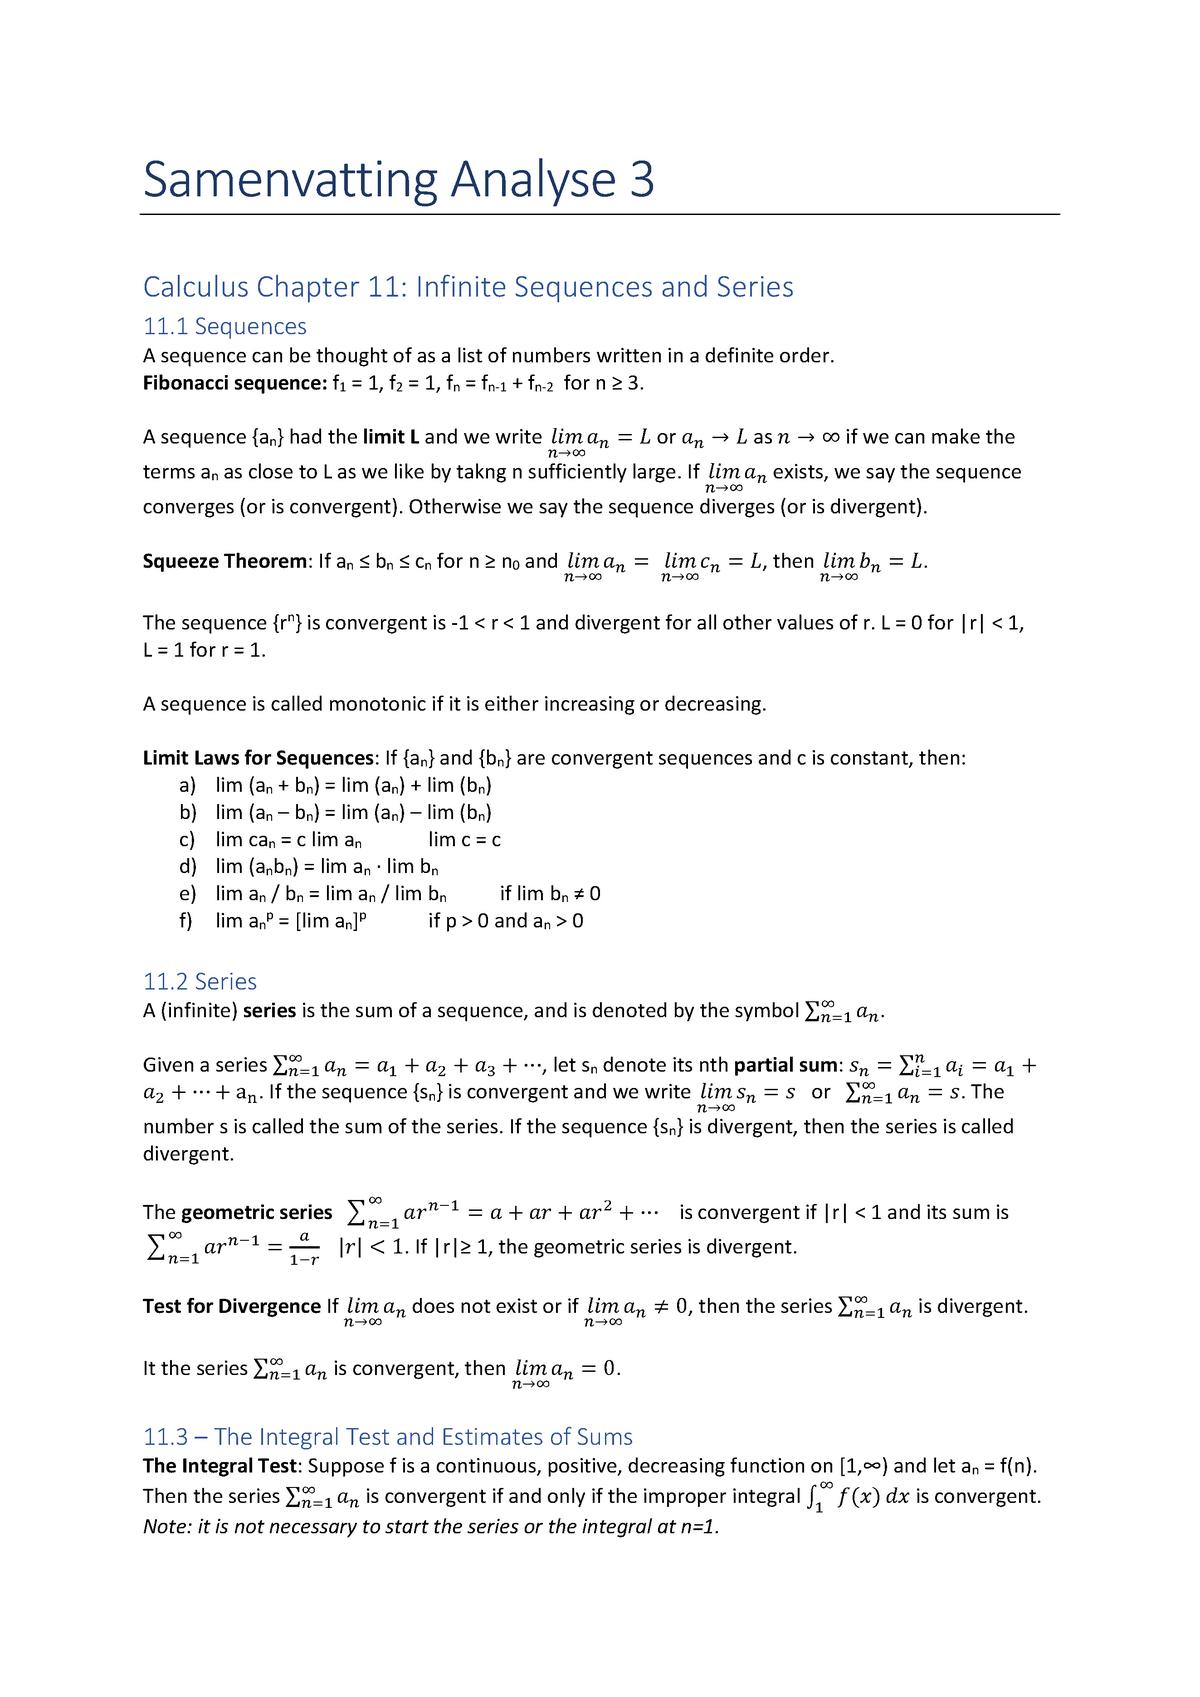 Samenvatting Analyse 3 - WBMT2048WI - StudeerSnel nl